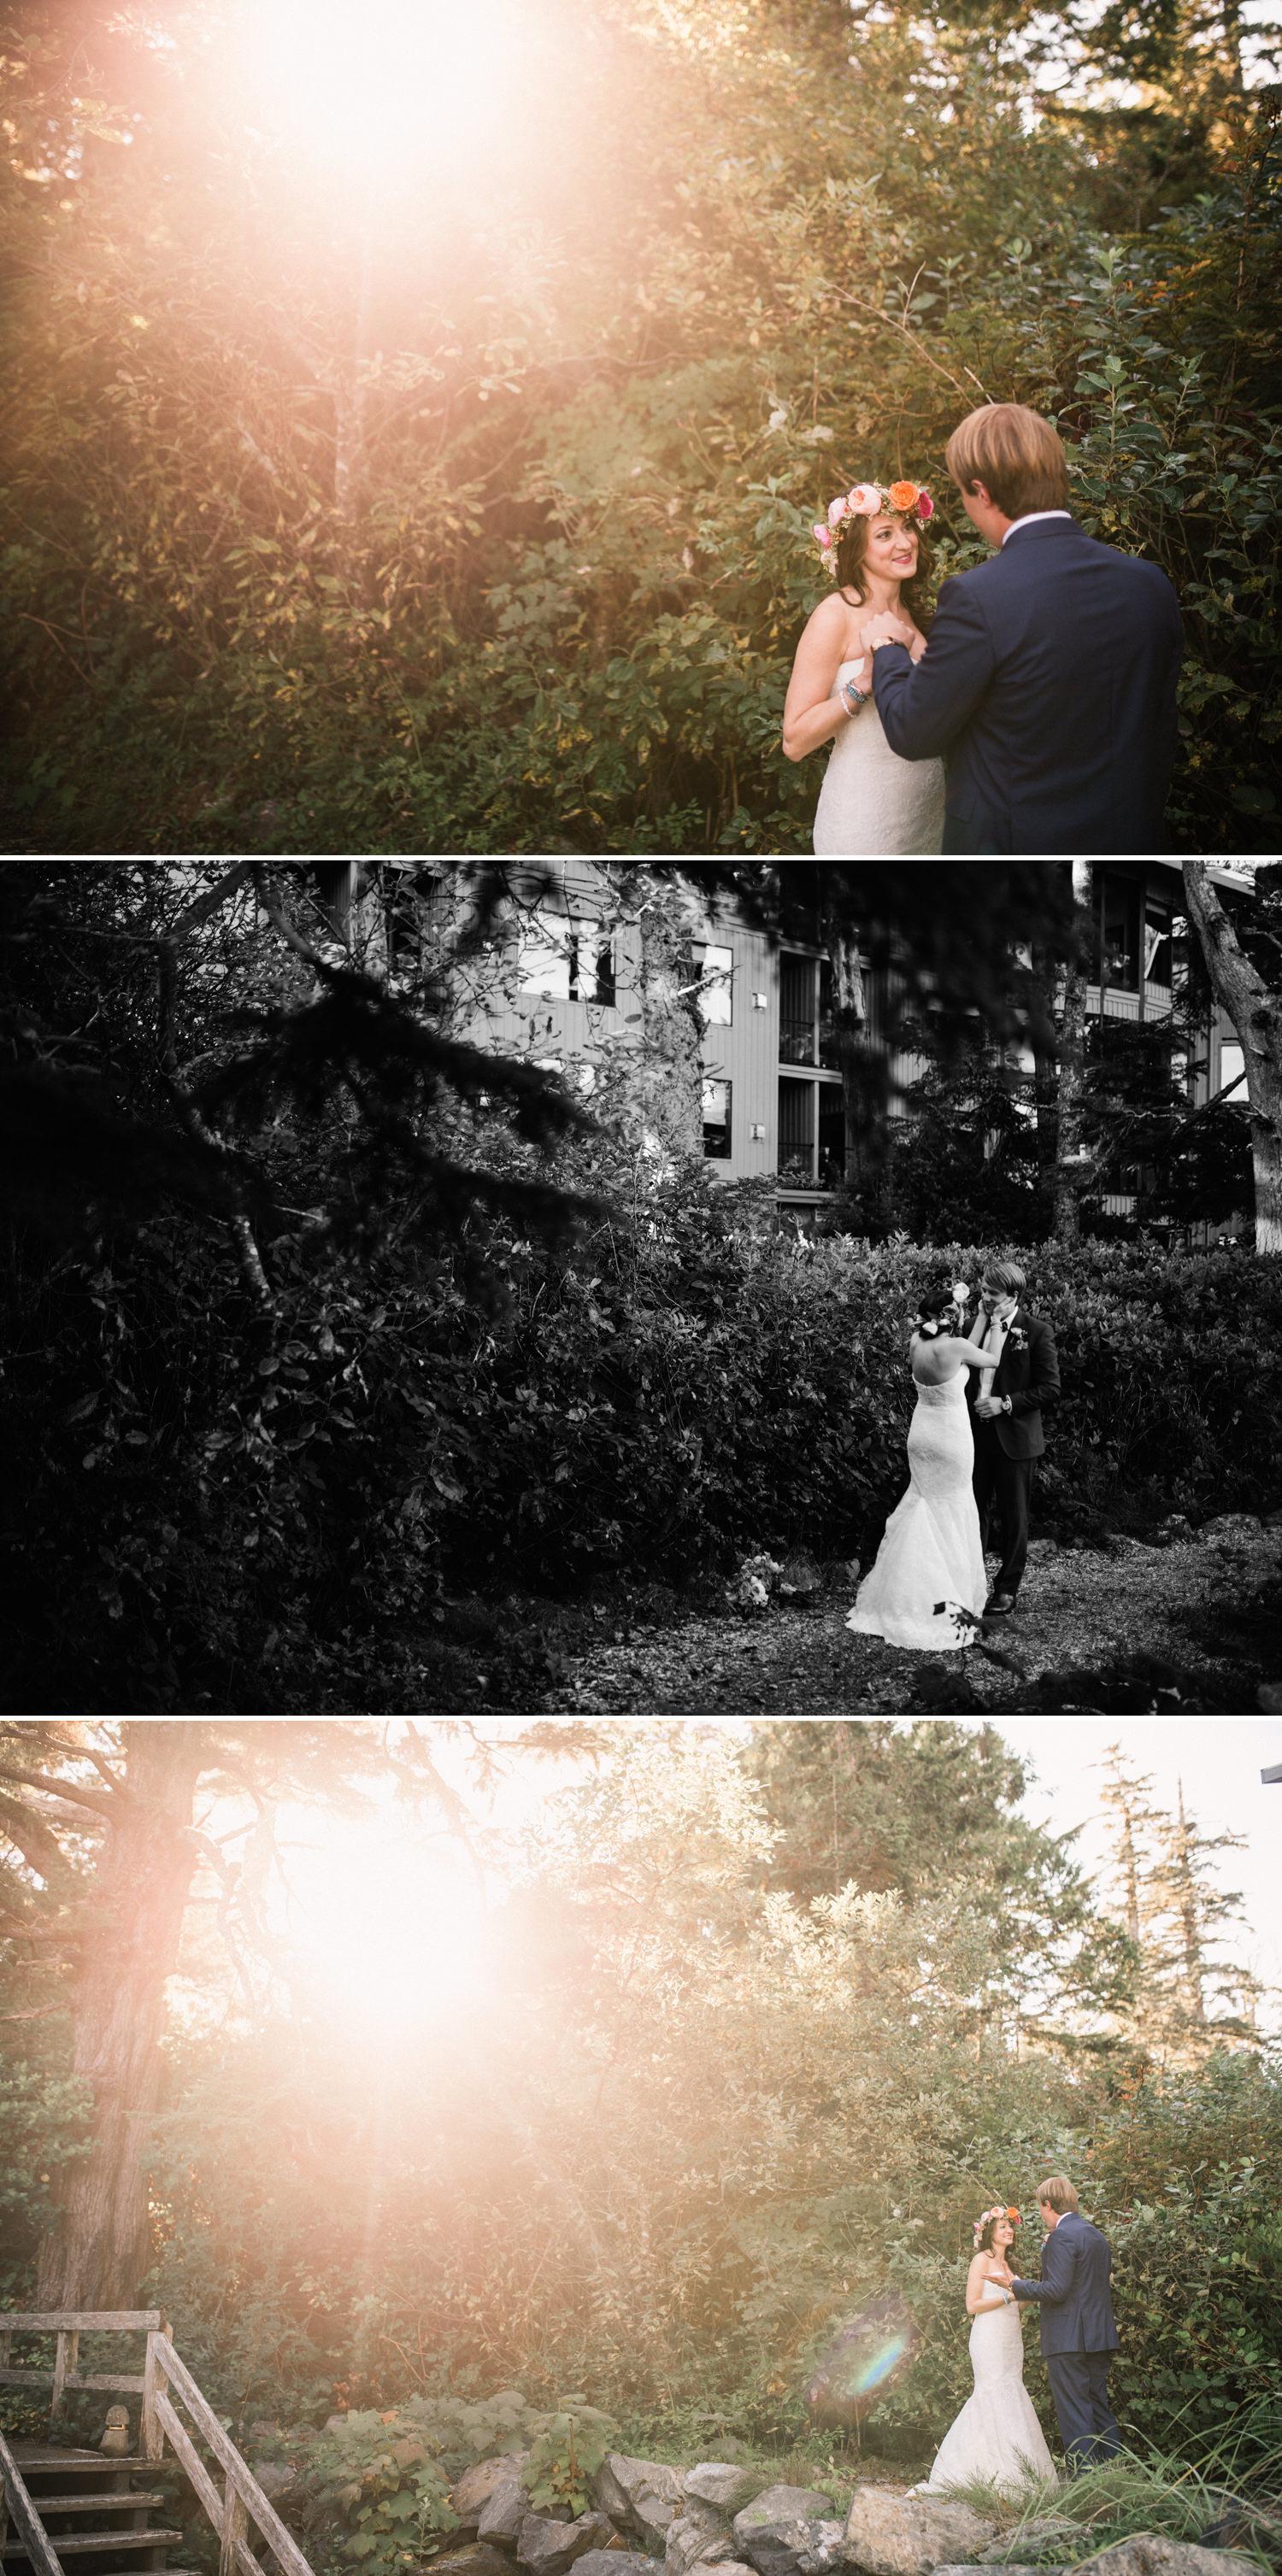 wickaninnish-inn-tofino-bc-elopement-ryan-flynn-photography-00023.JPG